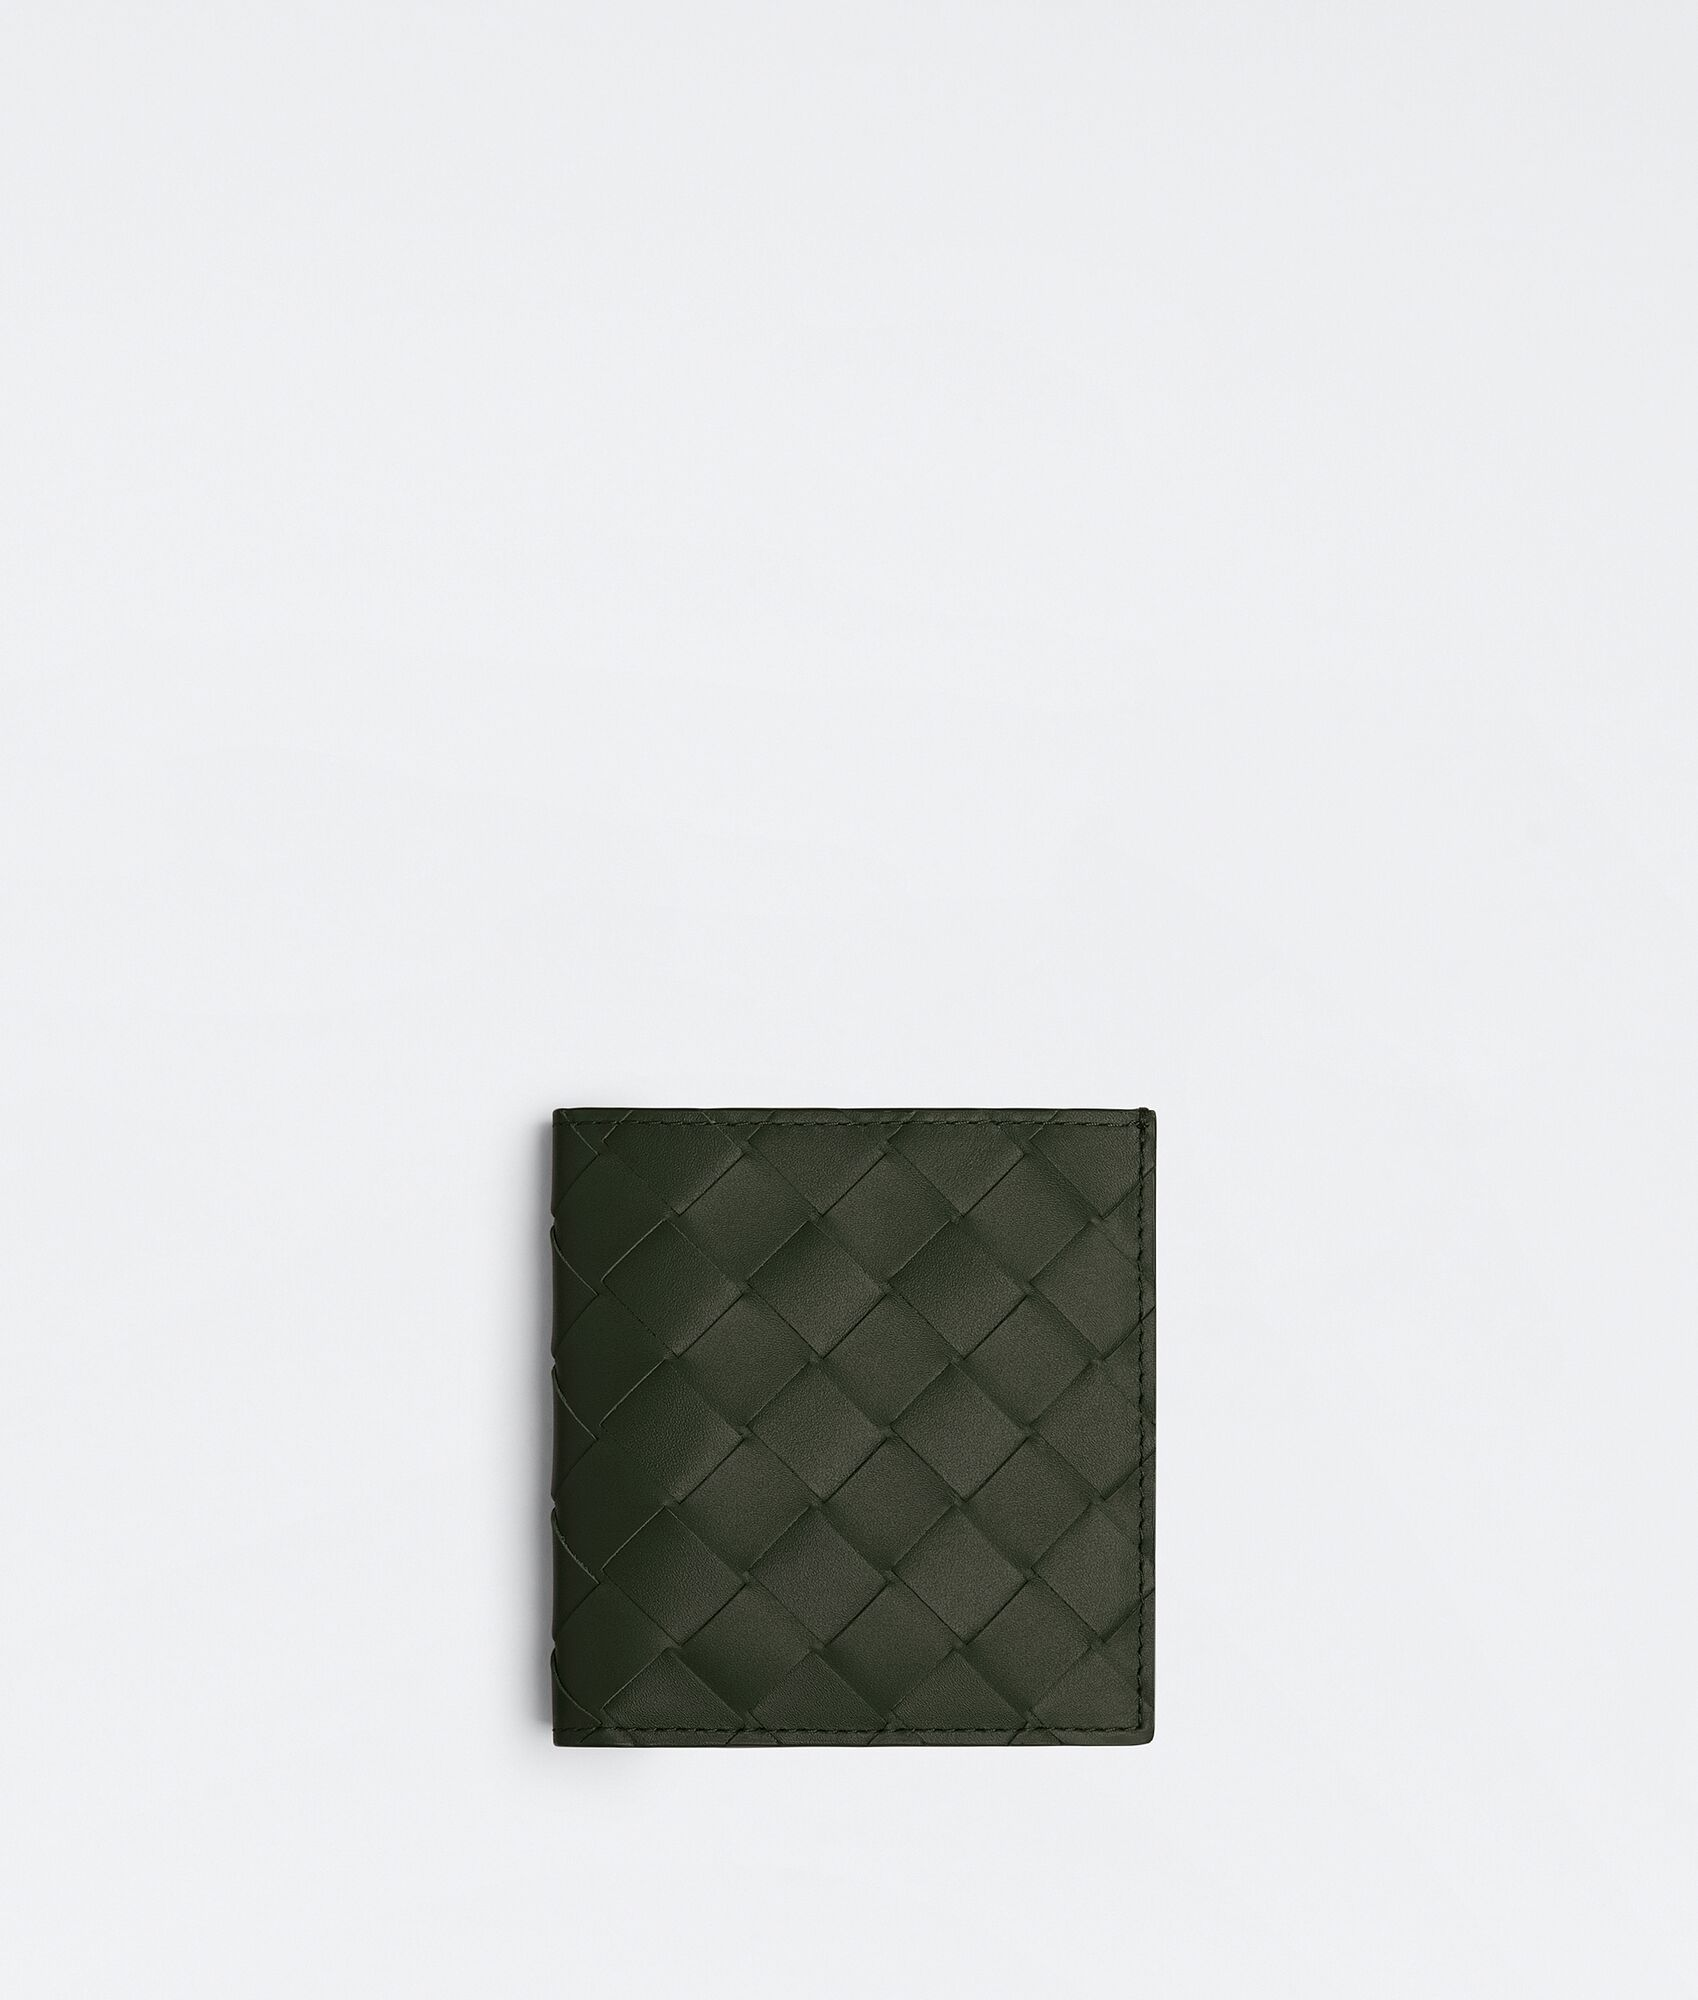 BOTTEGA VENETA ミニ財布 の外装画像